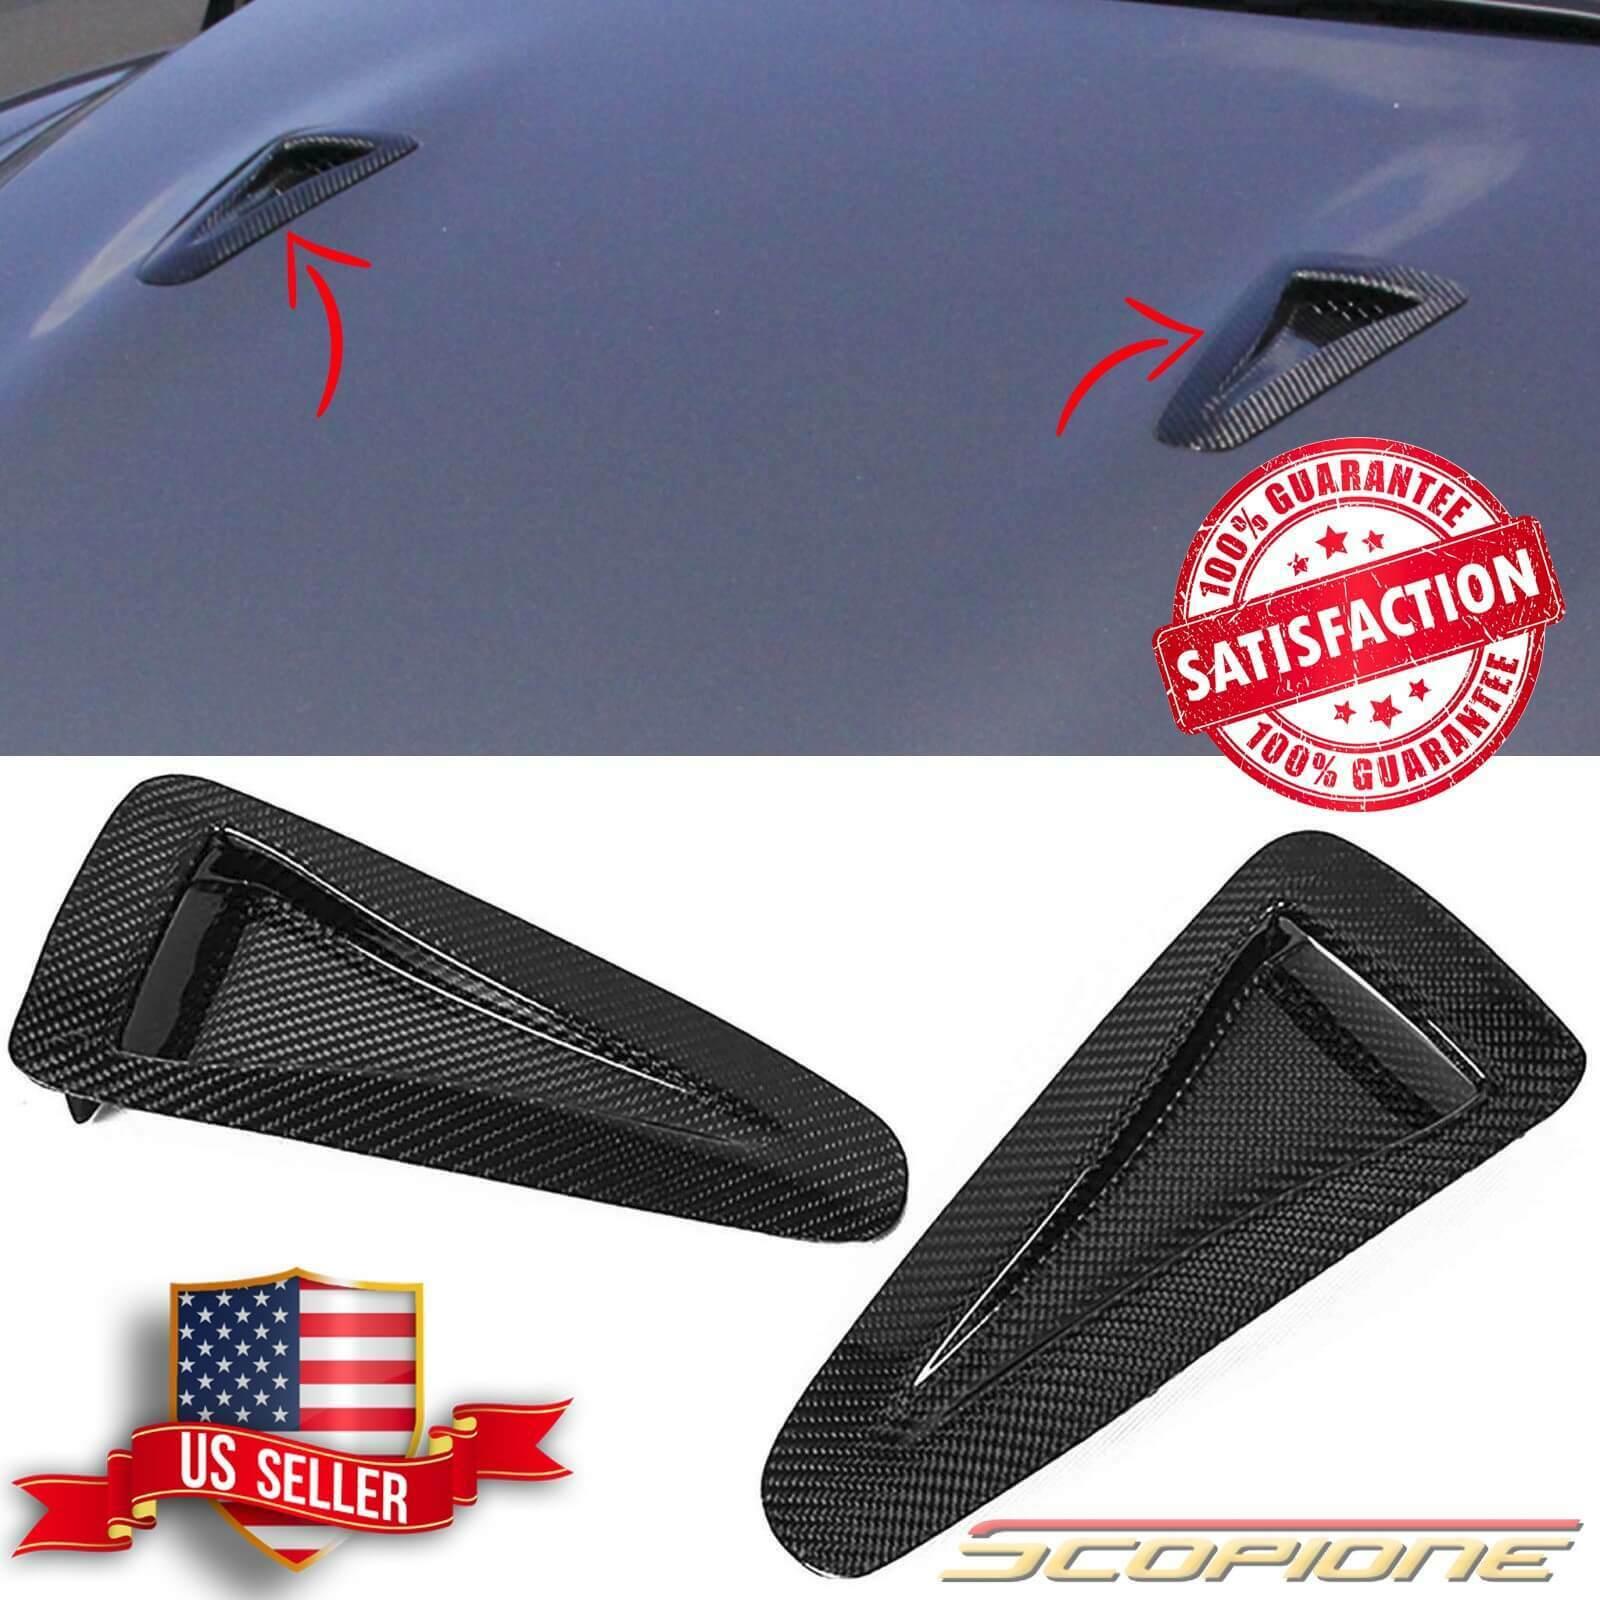 OLIKE for Nissan Skyline GTR35 GT-R R35 Carbon Fiber Hood Bonnet Scoops Vents Hood Air Vent